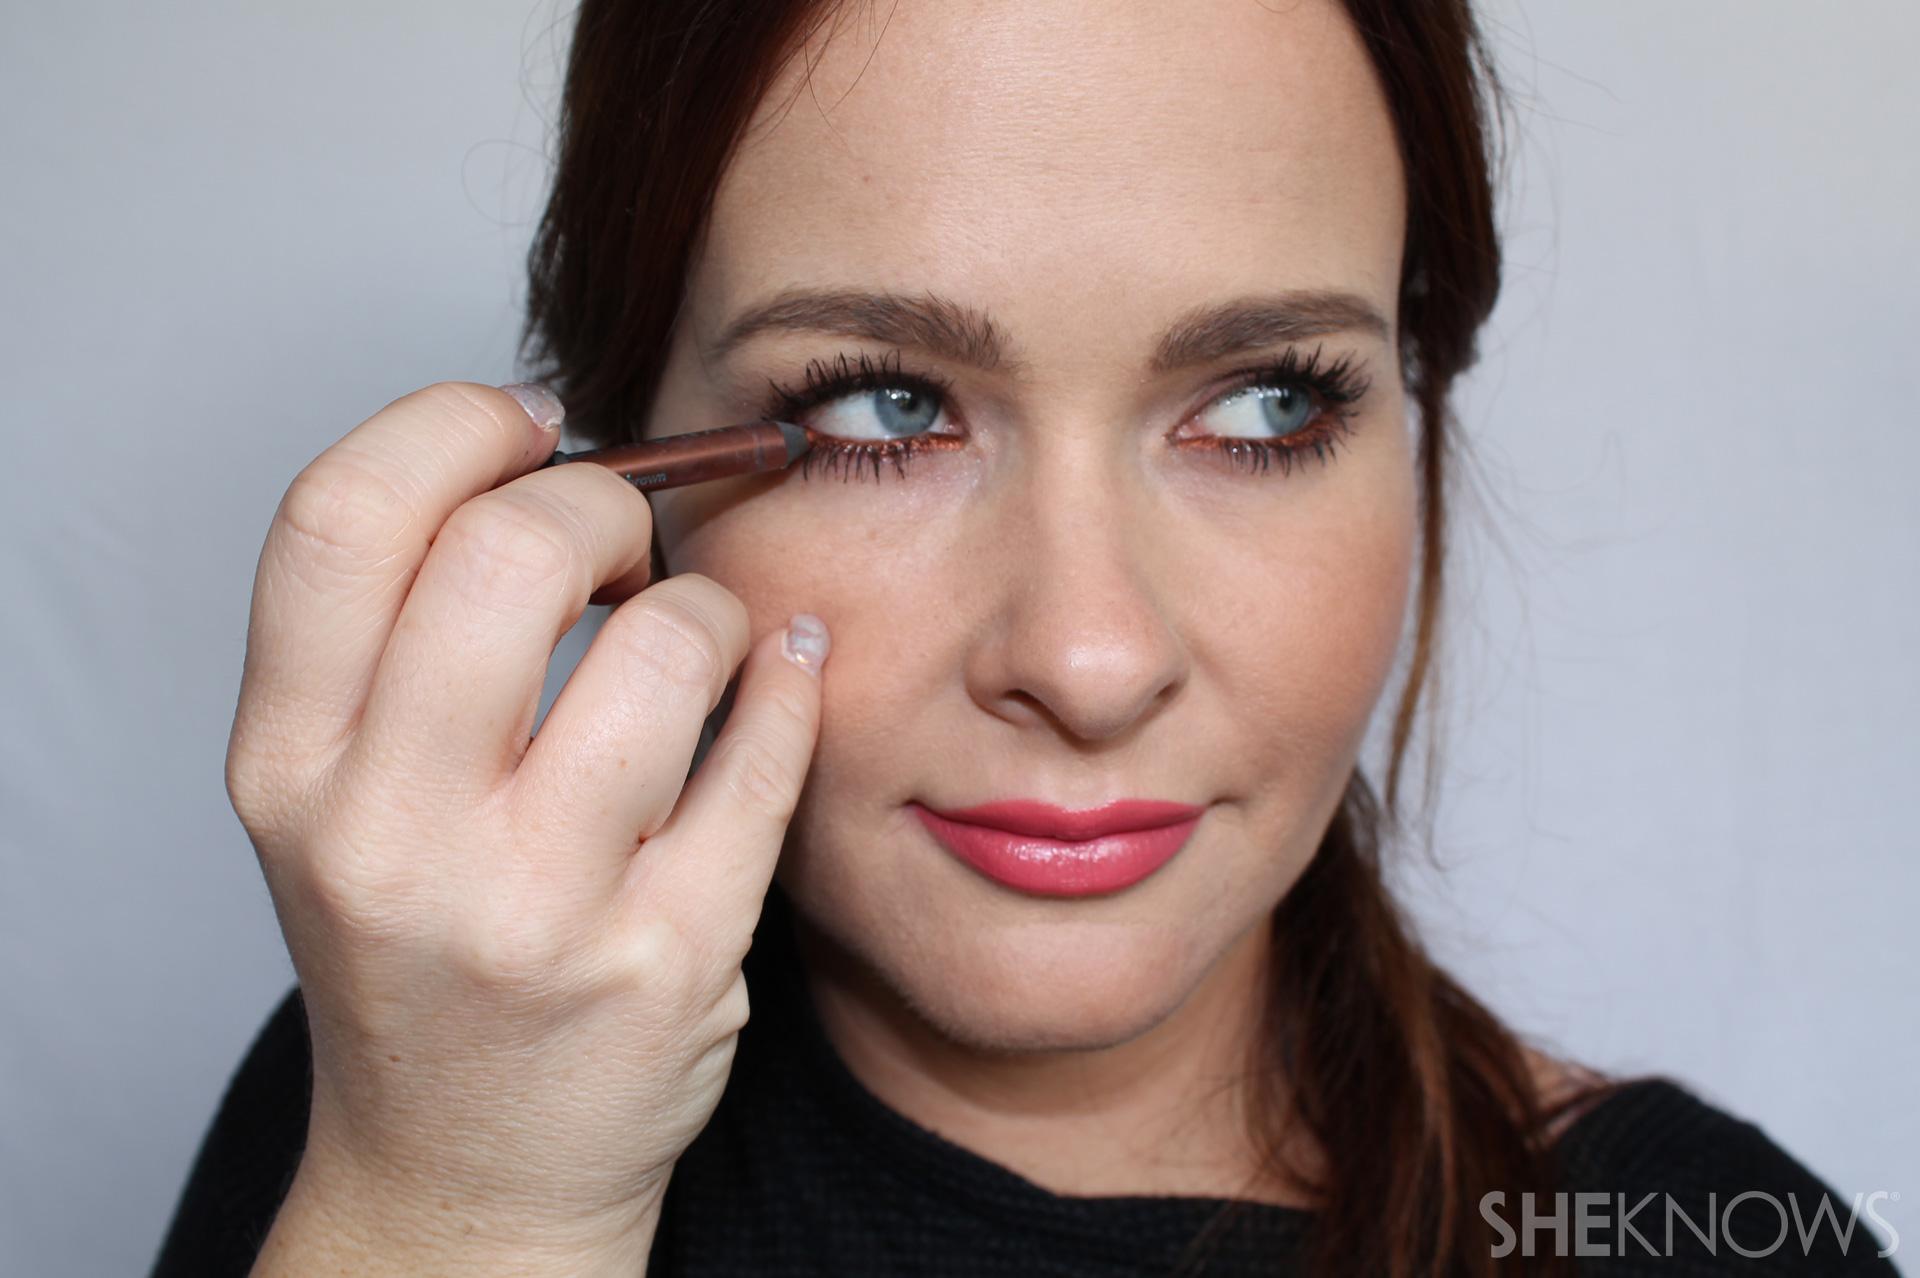 Inner rim Step 2: apply to other eye